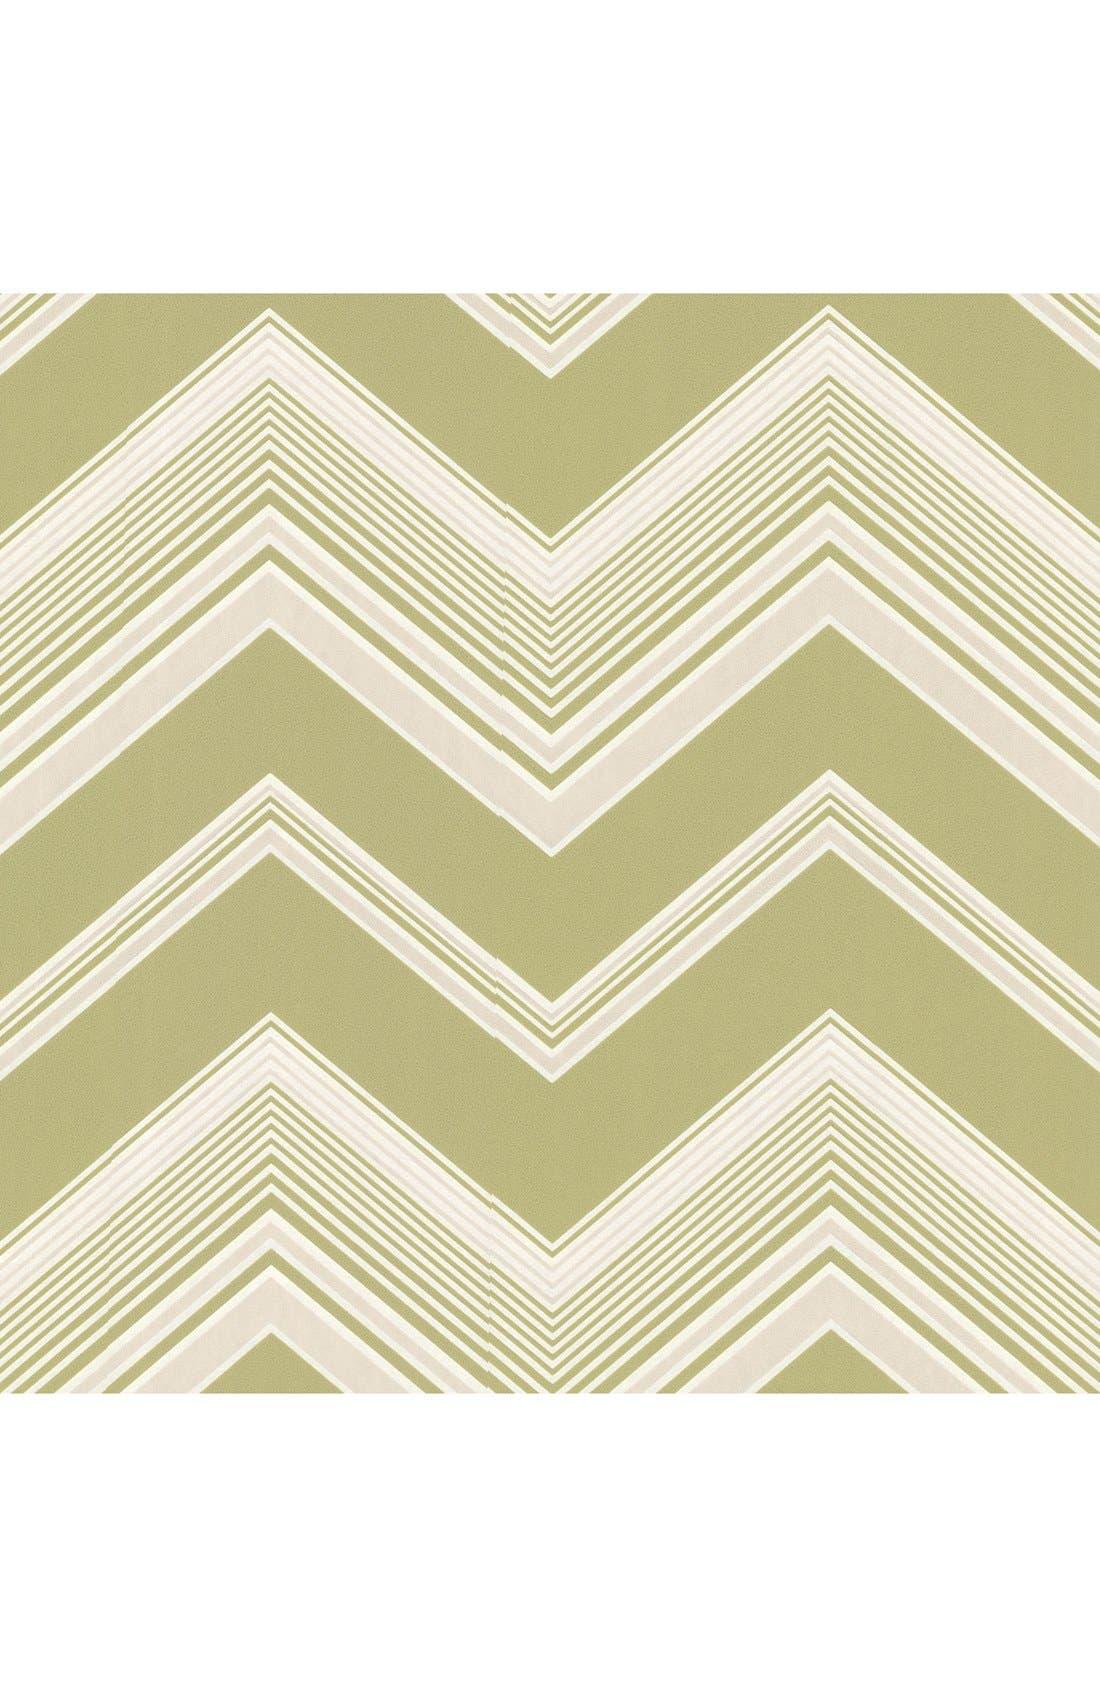 Main Image - Wallpops 'Bearden Light - Zigzag' Unpasted Wallpaper